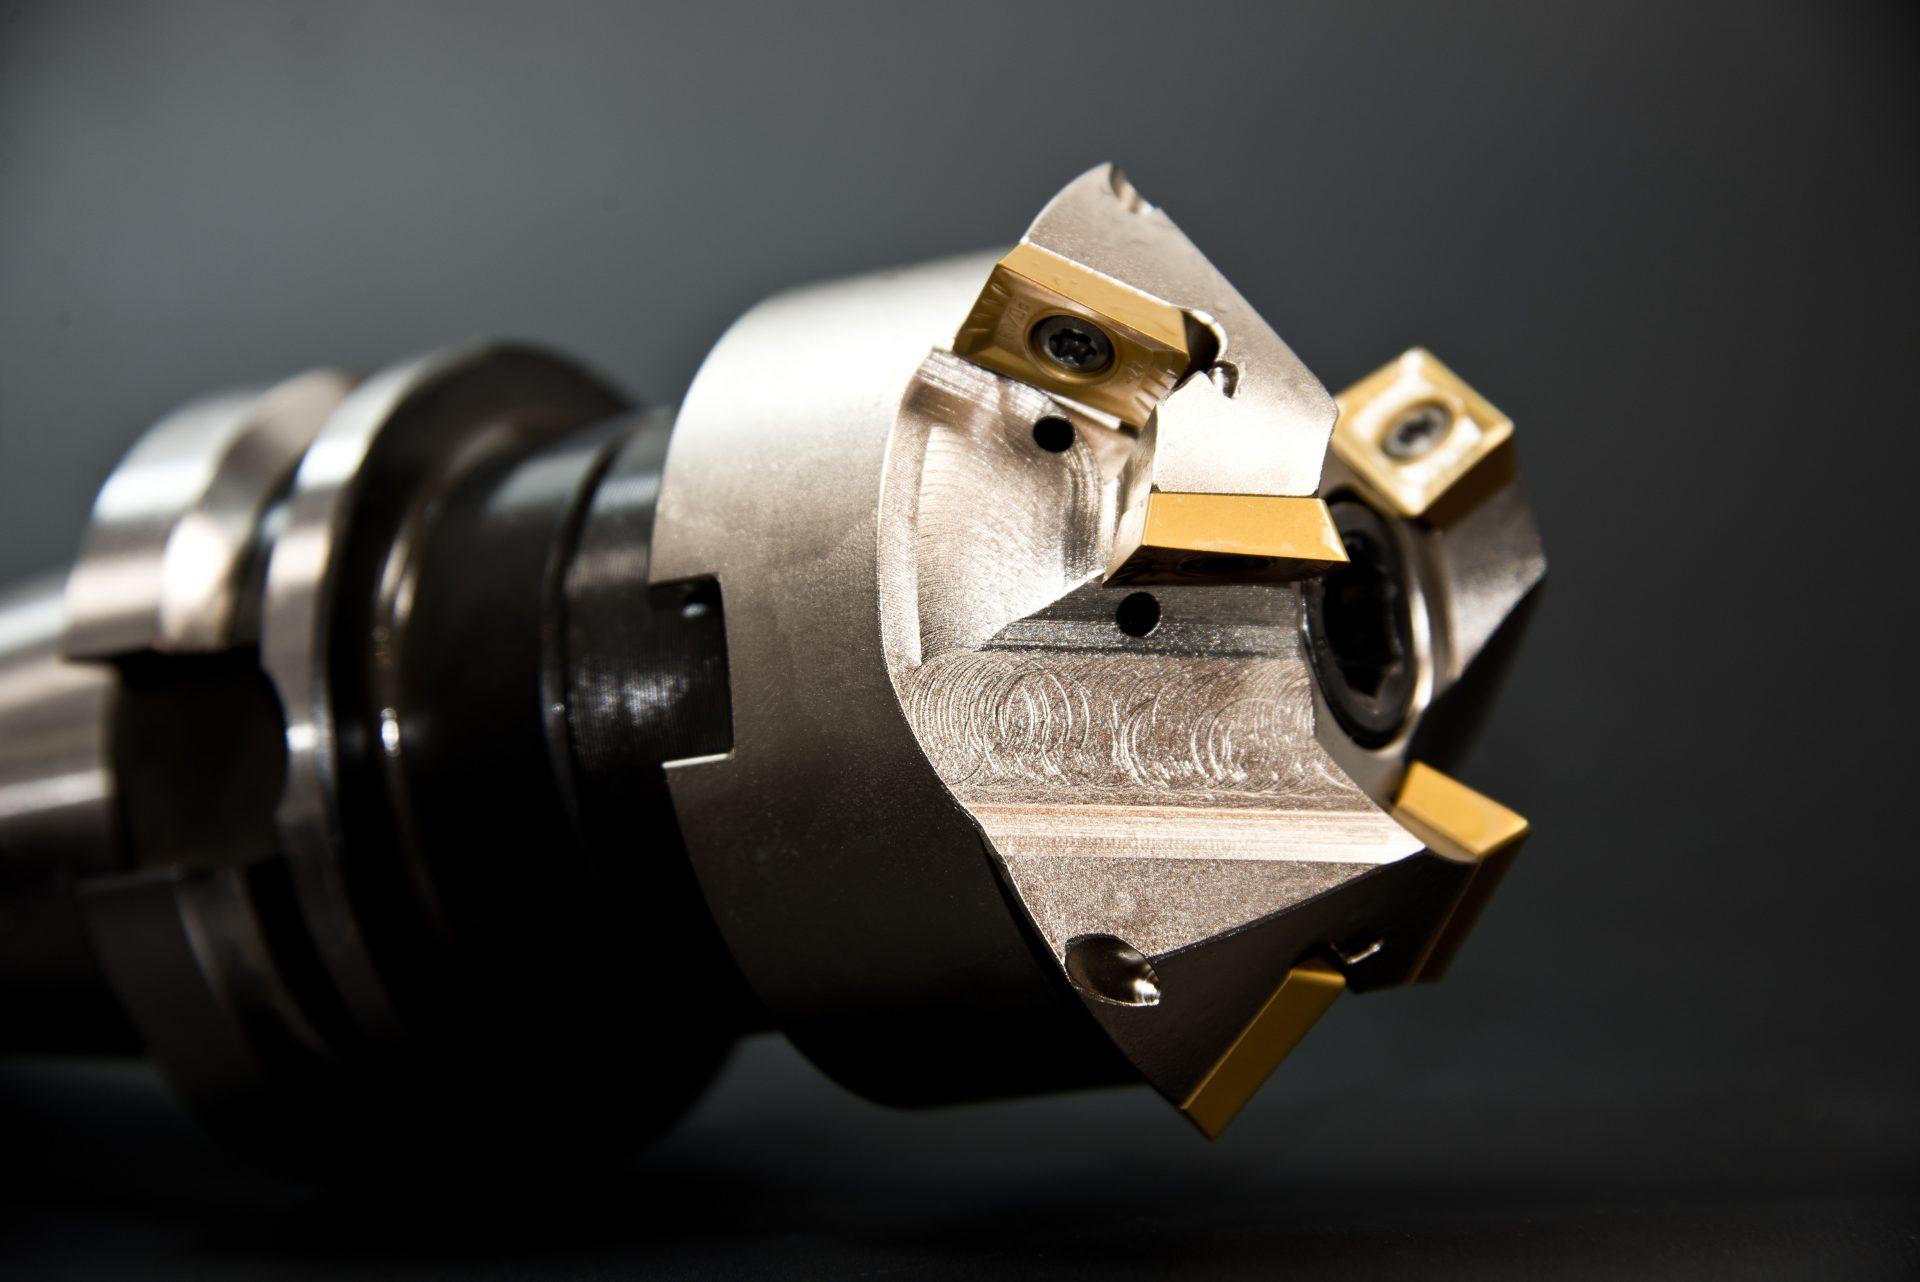 CNC Werkzeug KMS Hövelhof